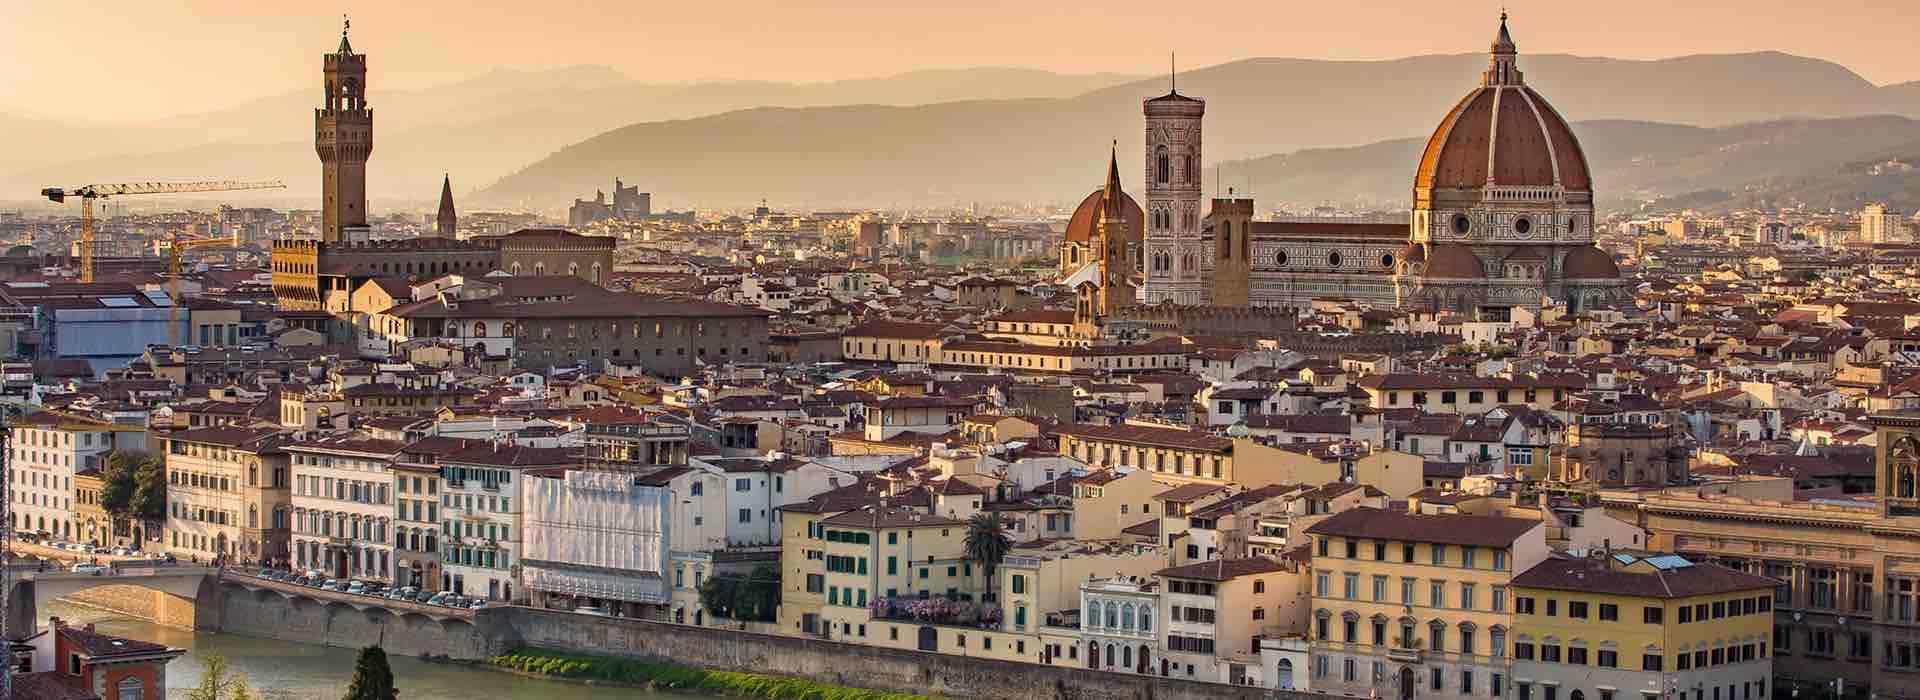 панорама города Флоренции